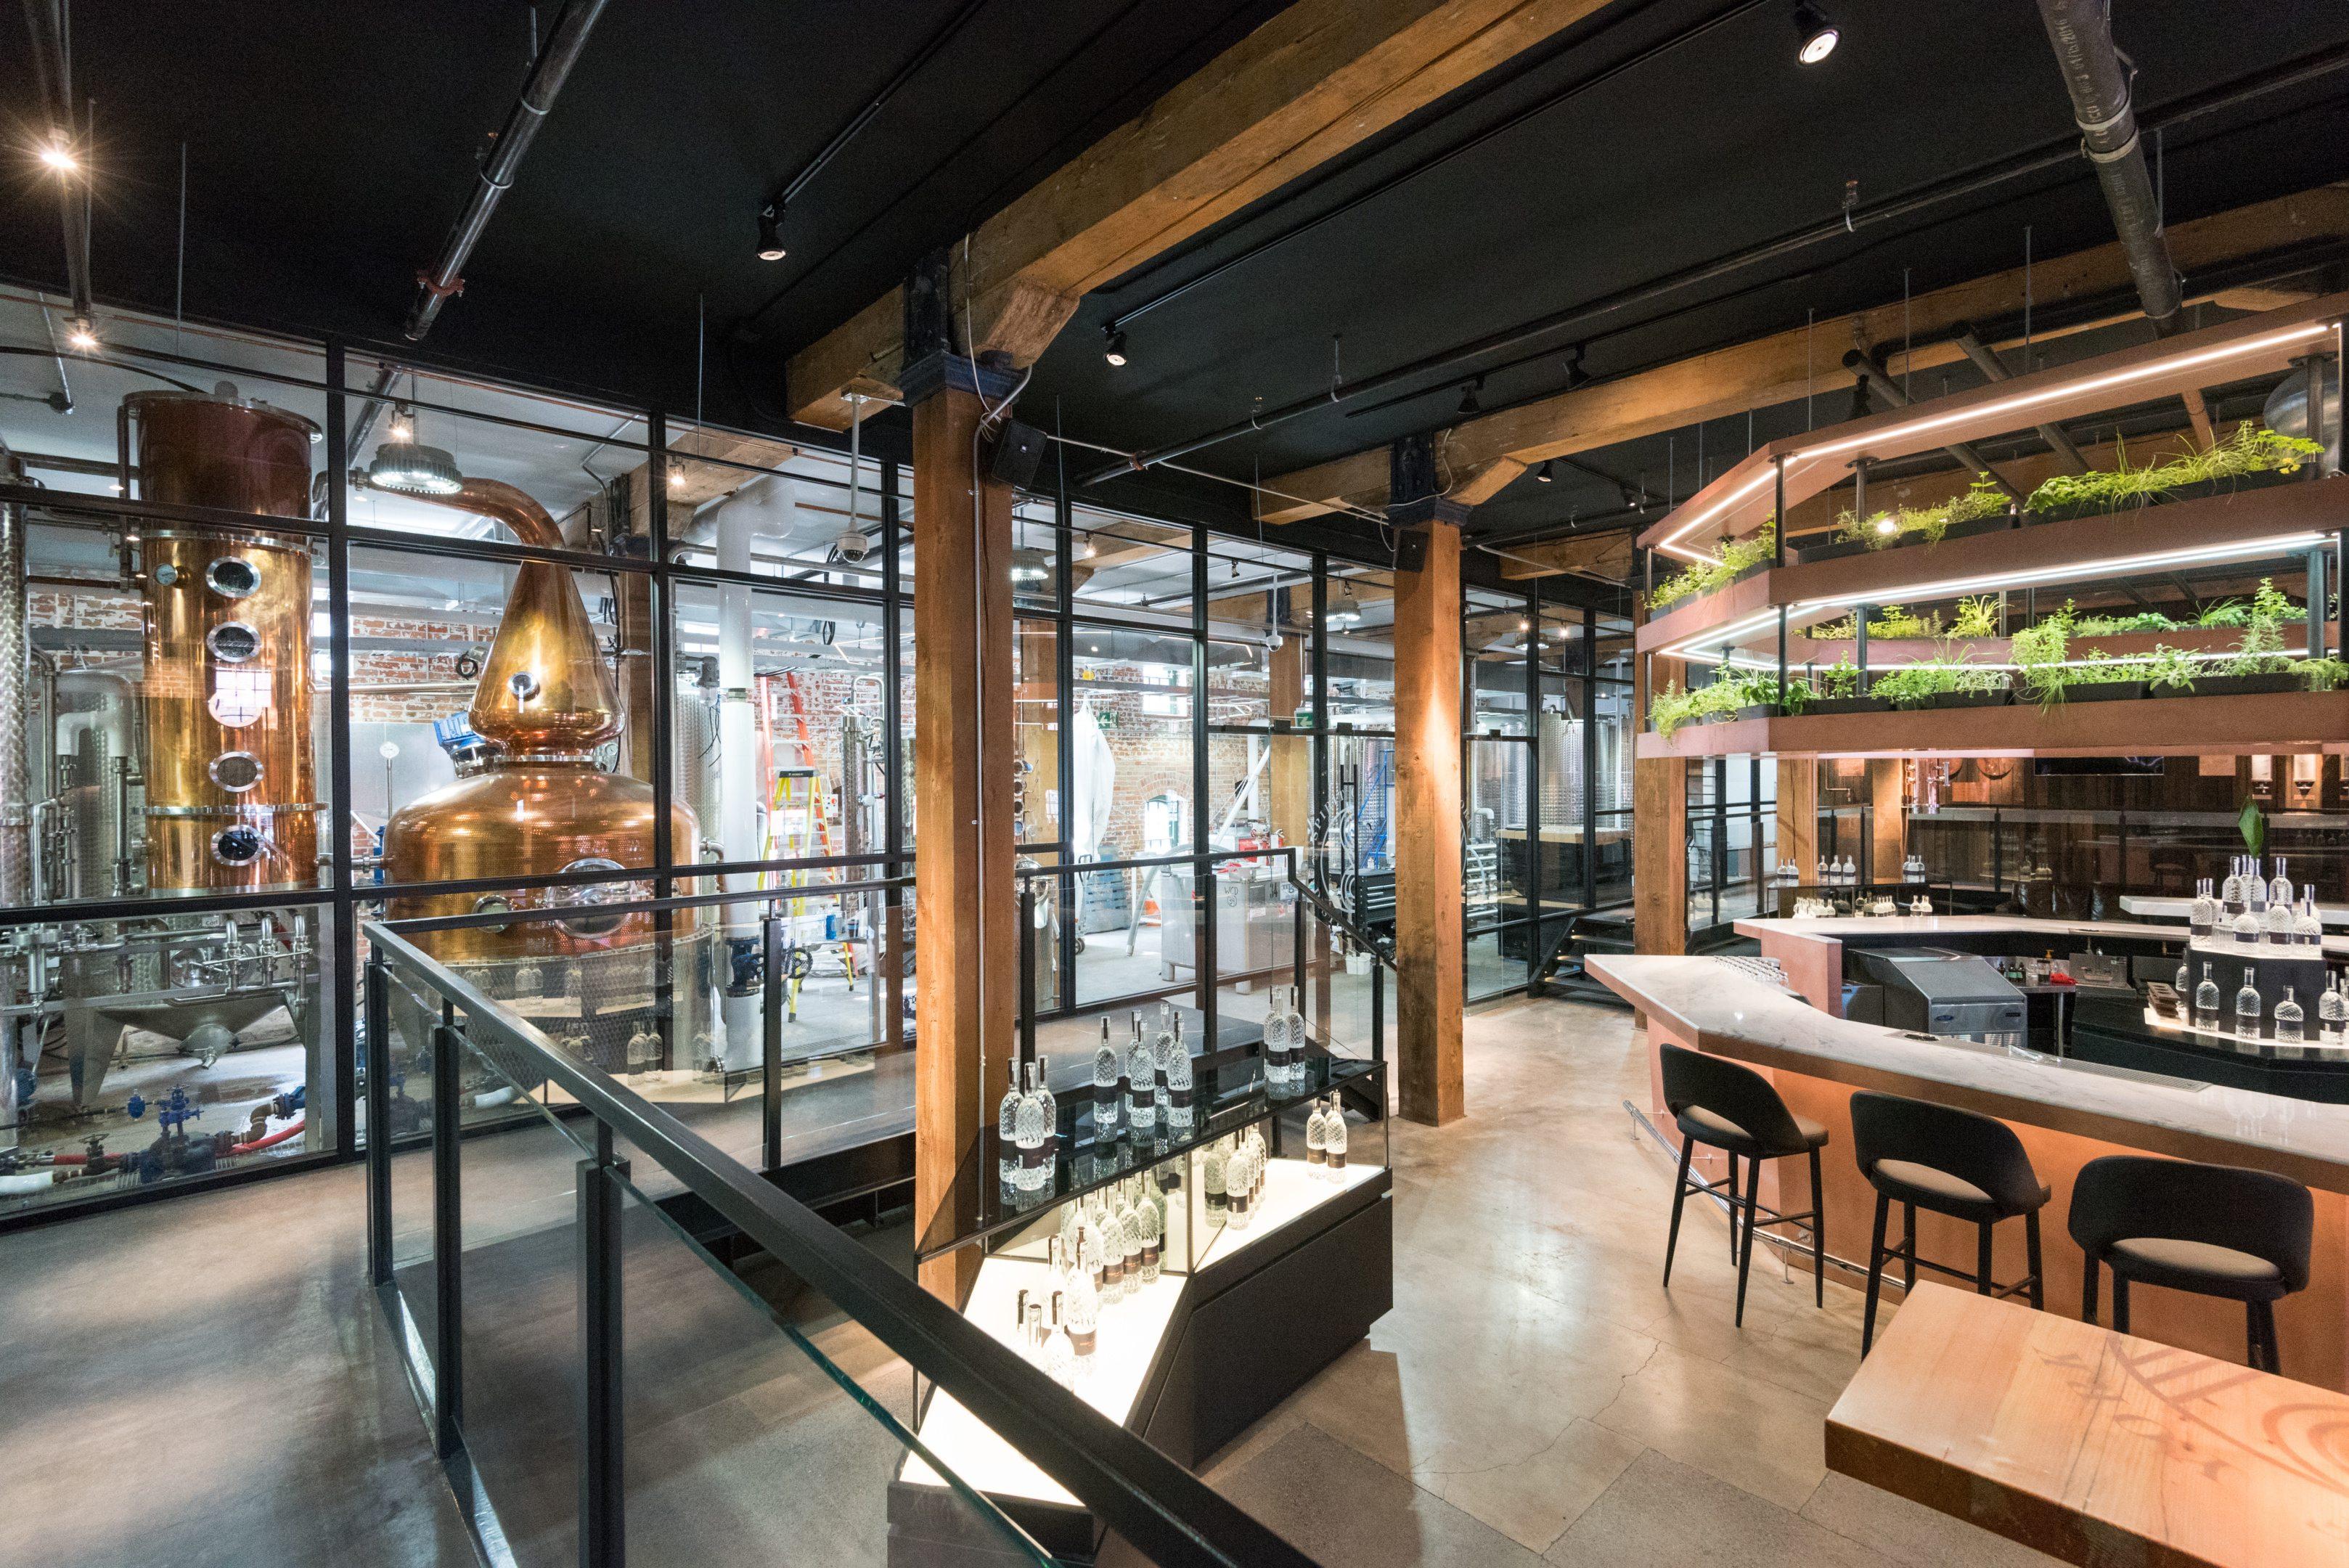 toronto-bars-spirit-of-york-distillery-co-distillery-district-room